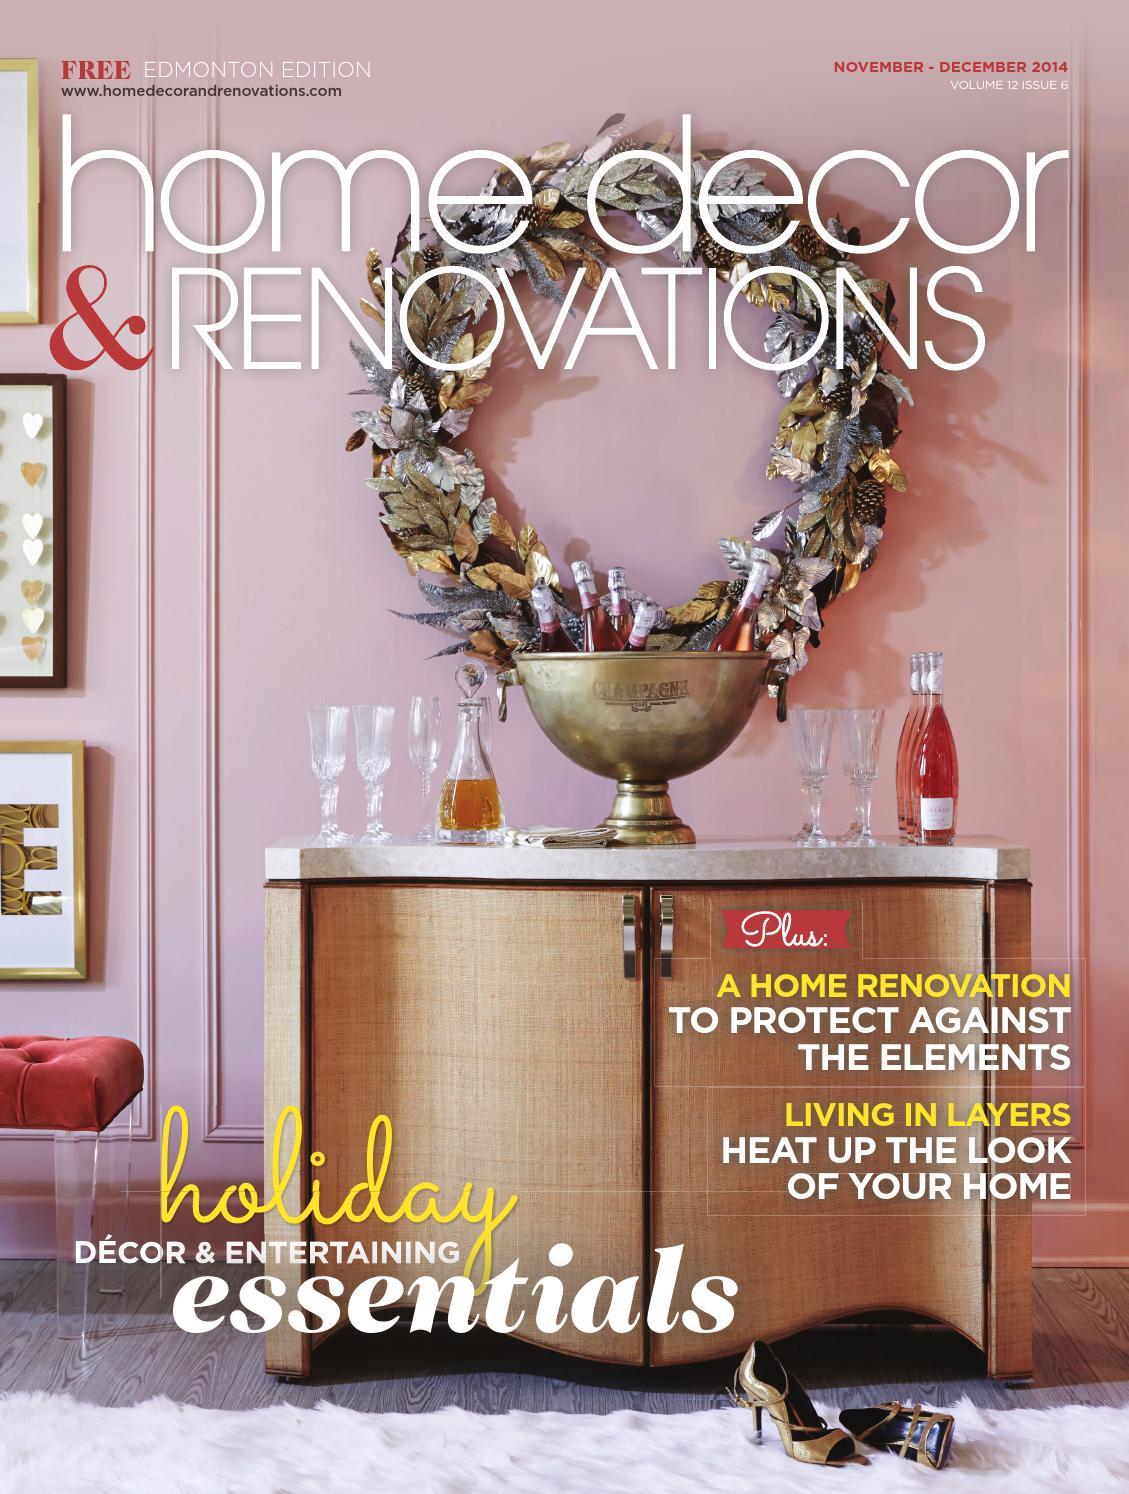 Edmonton home decor renovations nov dec 2014 by for Home decorating edmonton